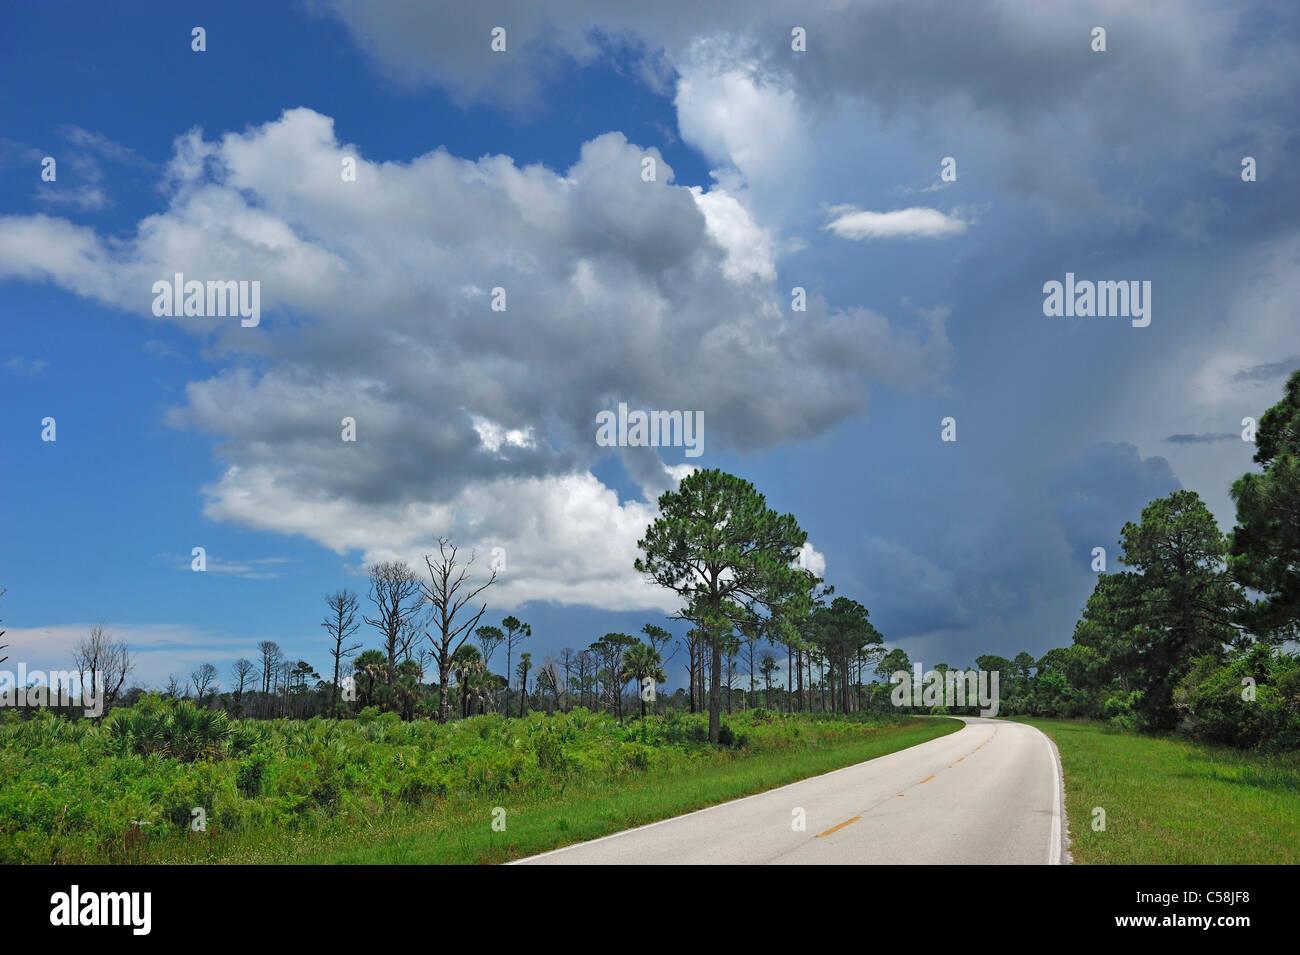 Storm clouds, building up, Merritt Island, National Wildlife Refuge, Florida, USA, United States, America, road - Stock Image